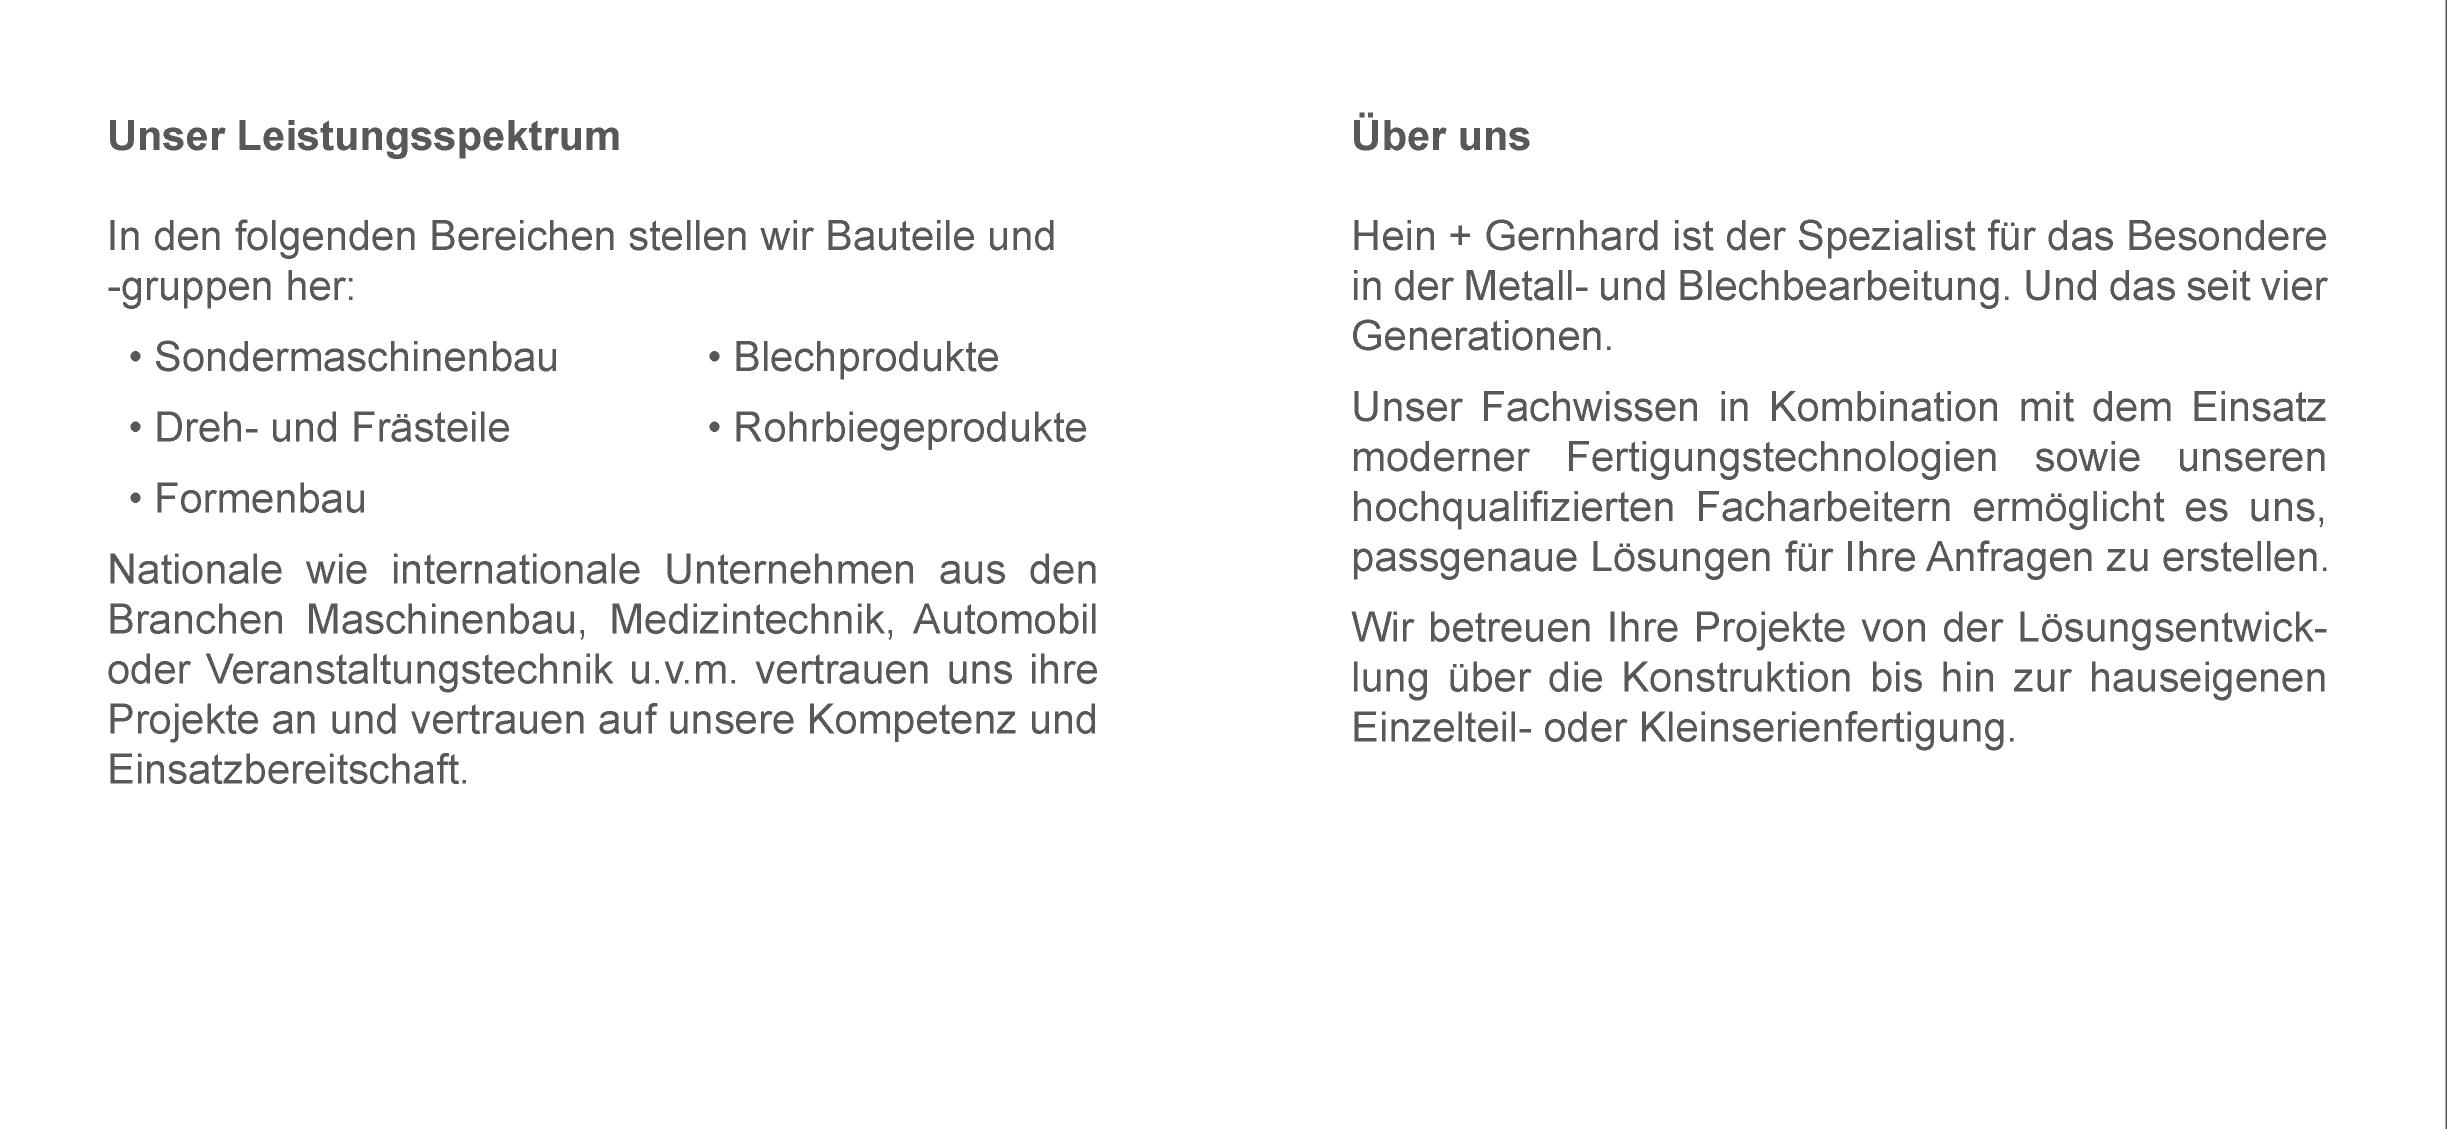 Flyer-Text-2 NEU: Mehr Variationen CNC-Fräsen